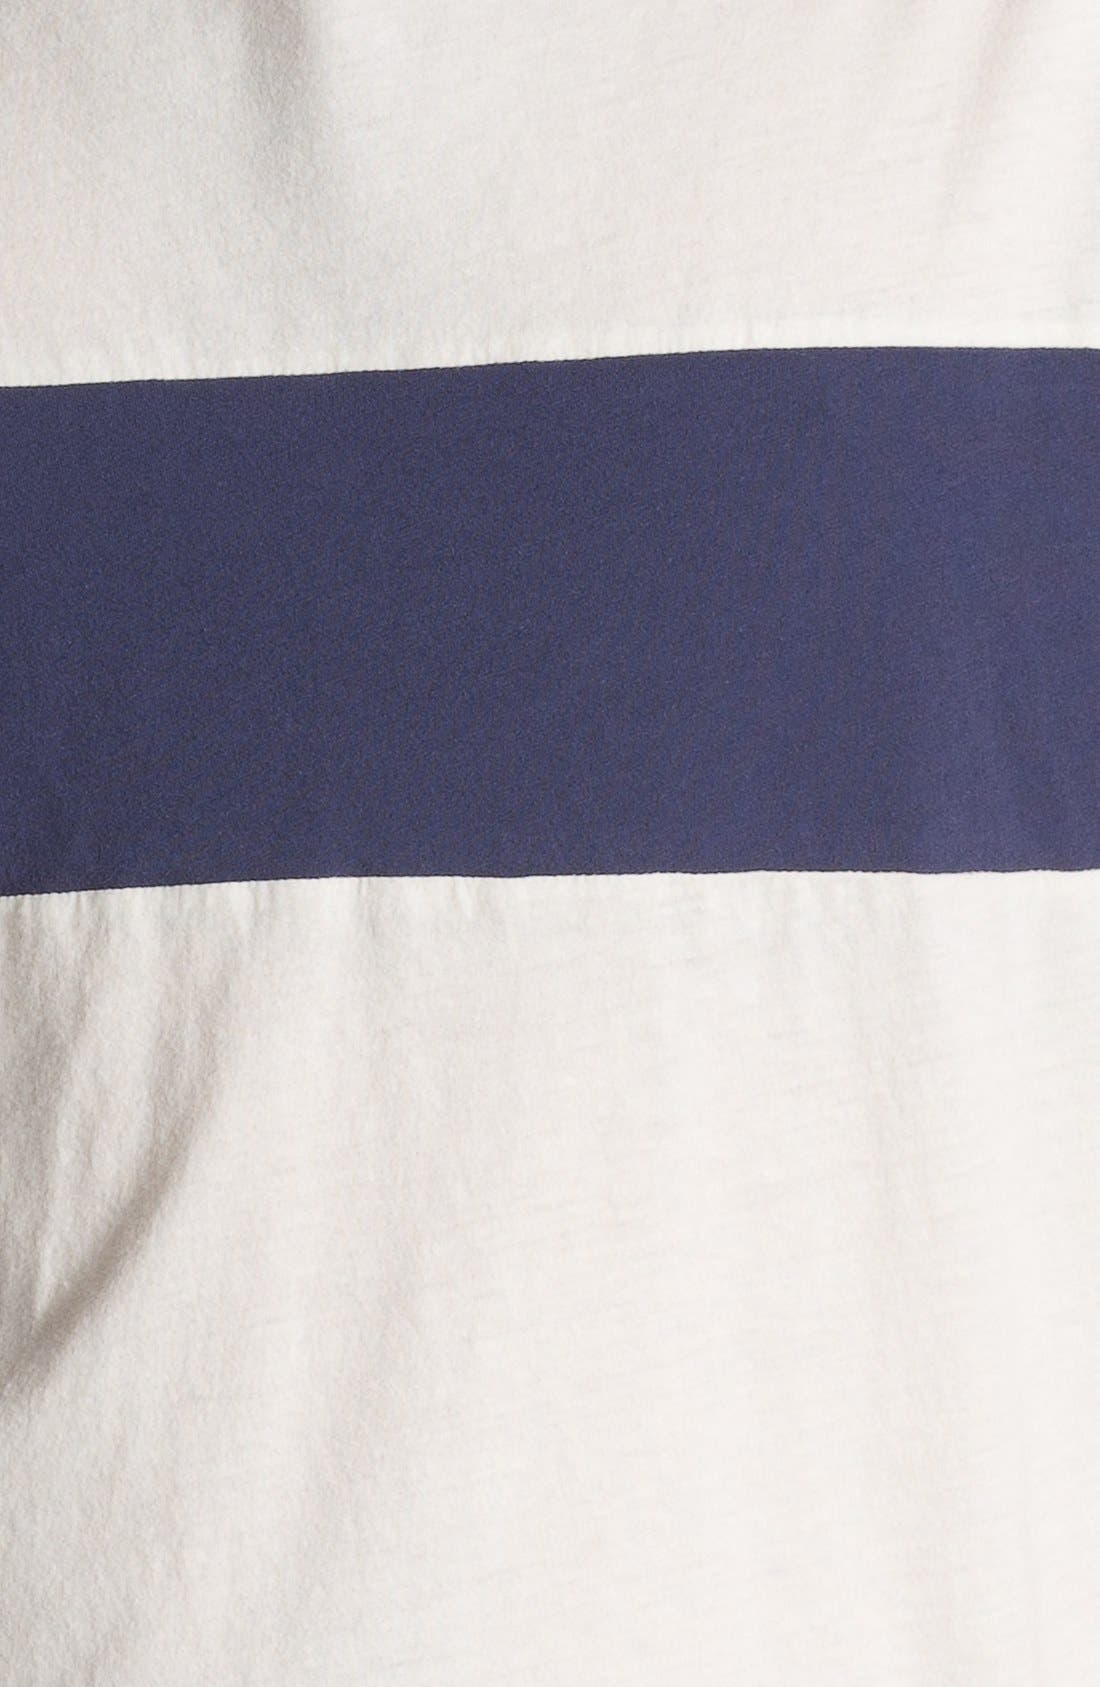 Alternate Image 3  - Gant Rugger 'Cut & Sewn' T-Shirt